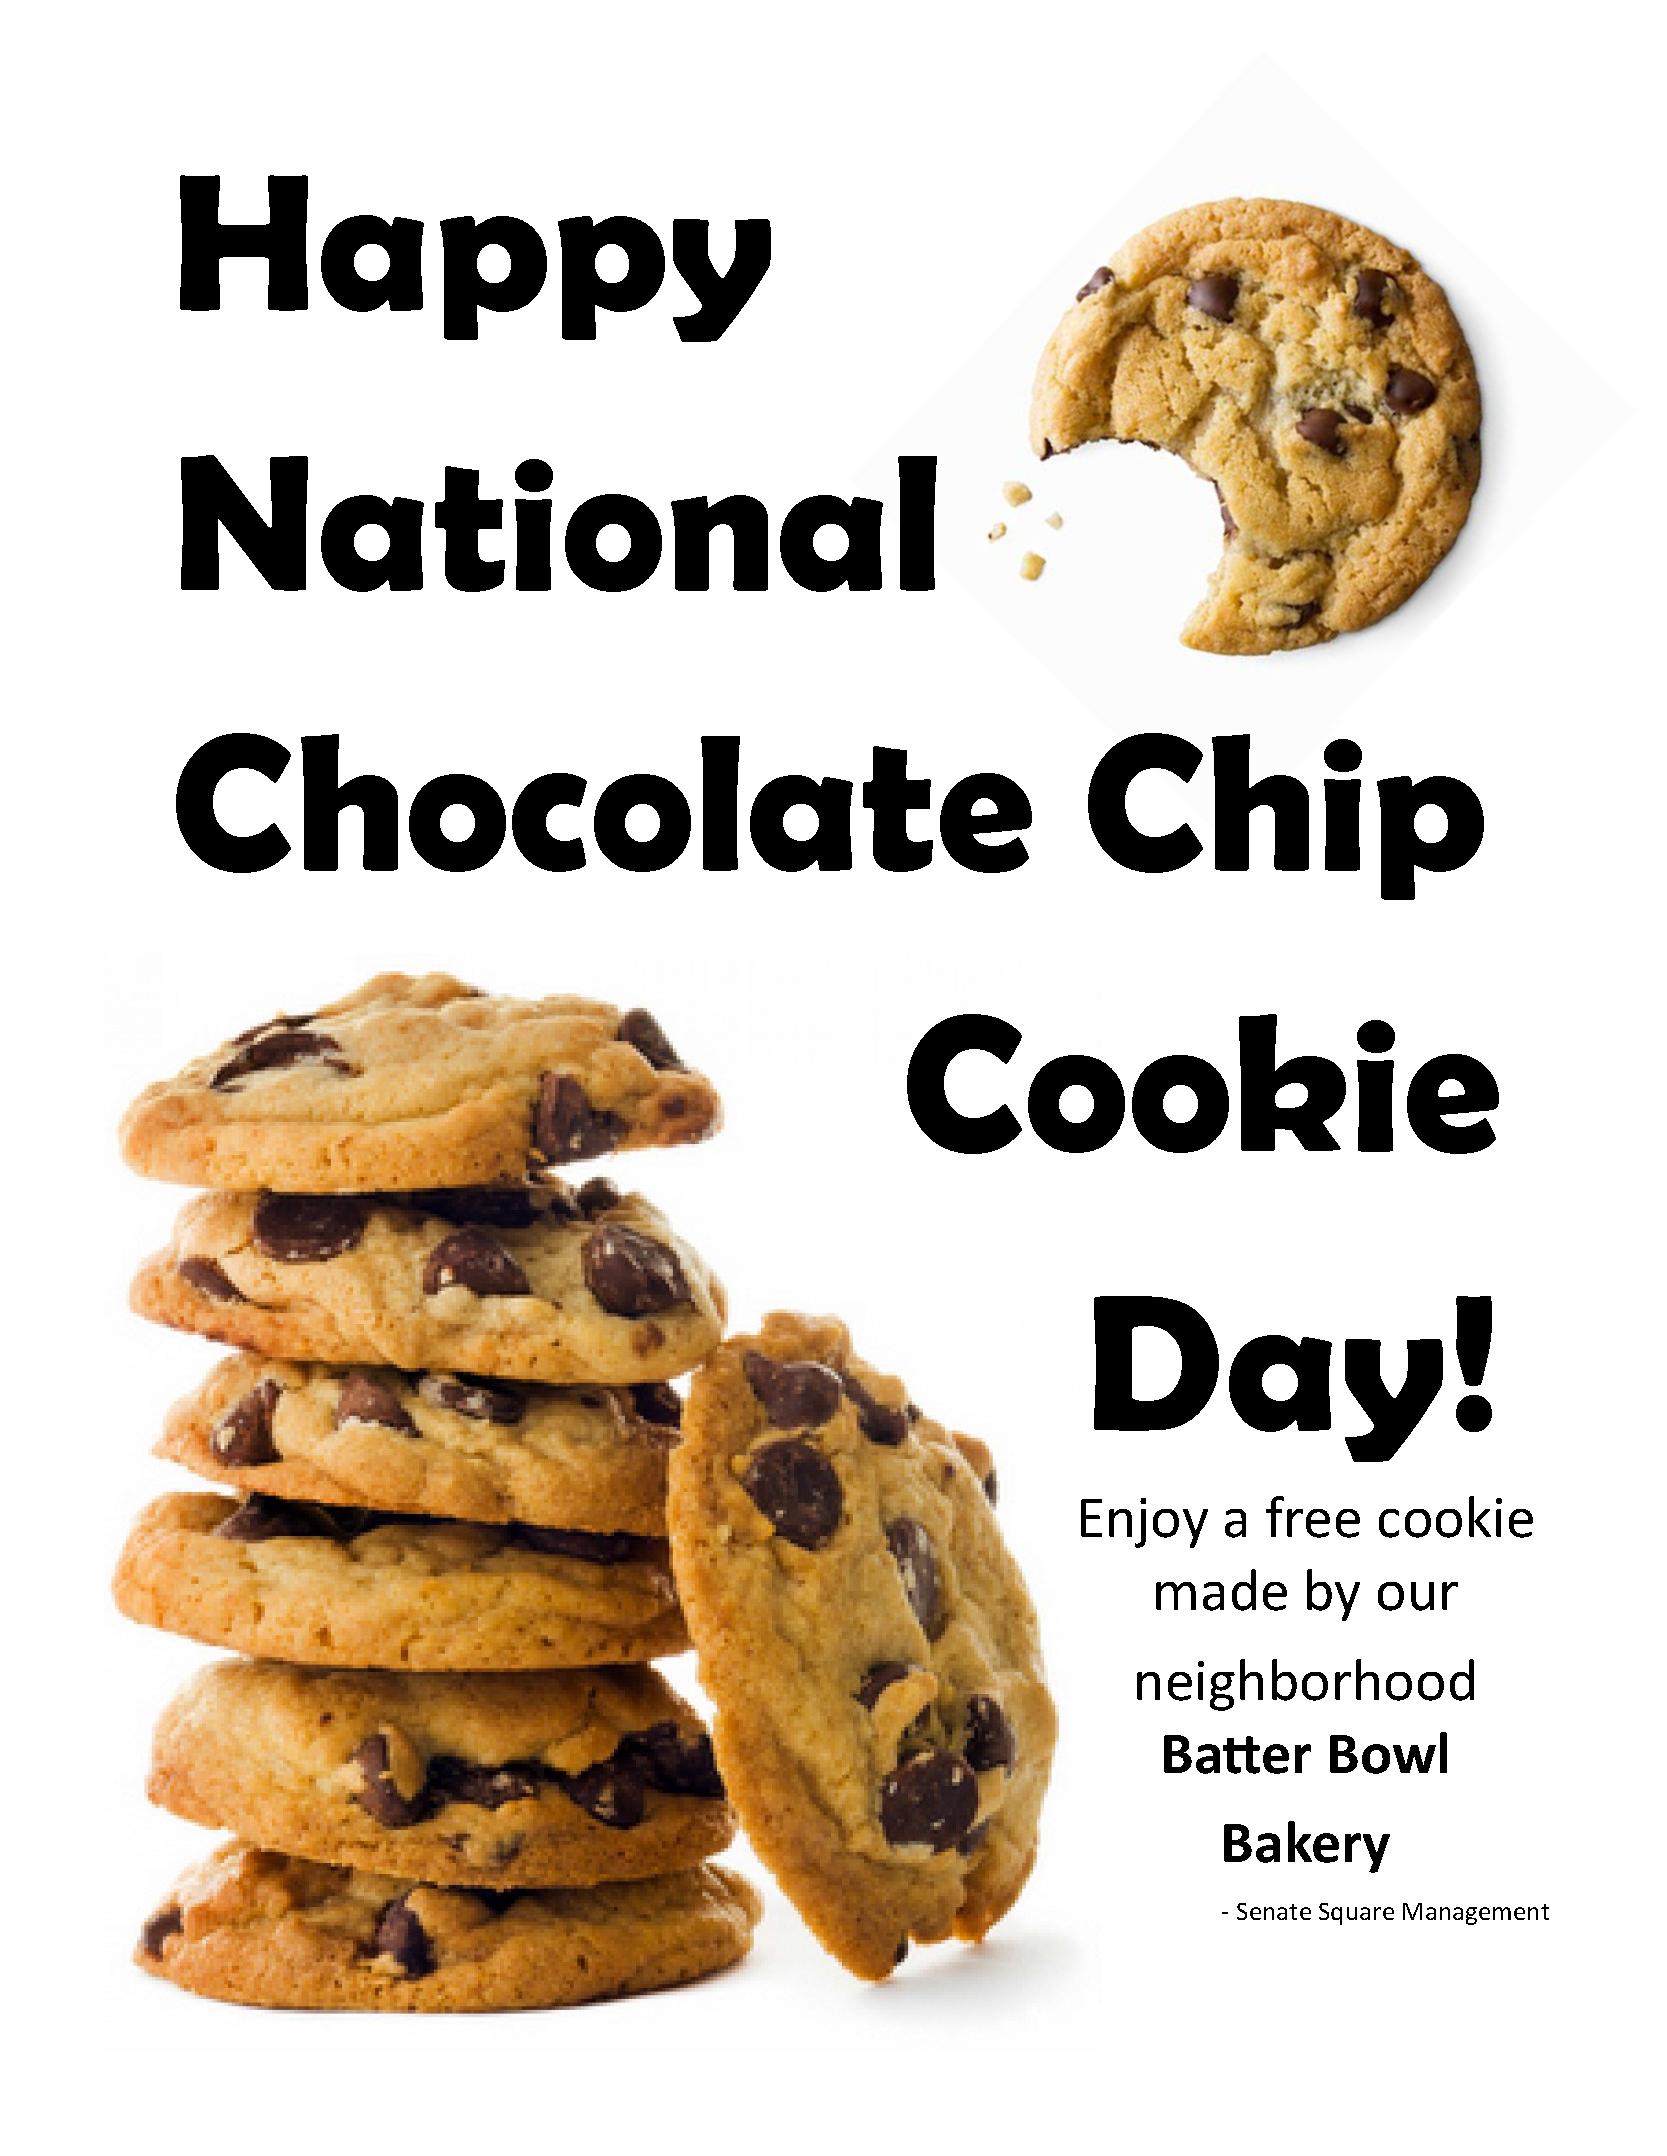 National Chocolate Chip Cookie Day – erica susan krauss